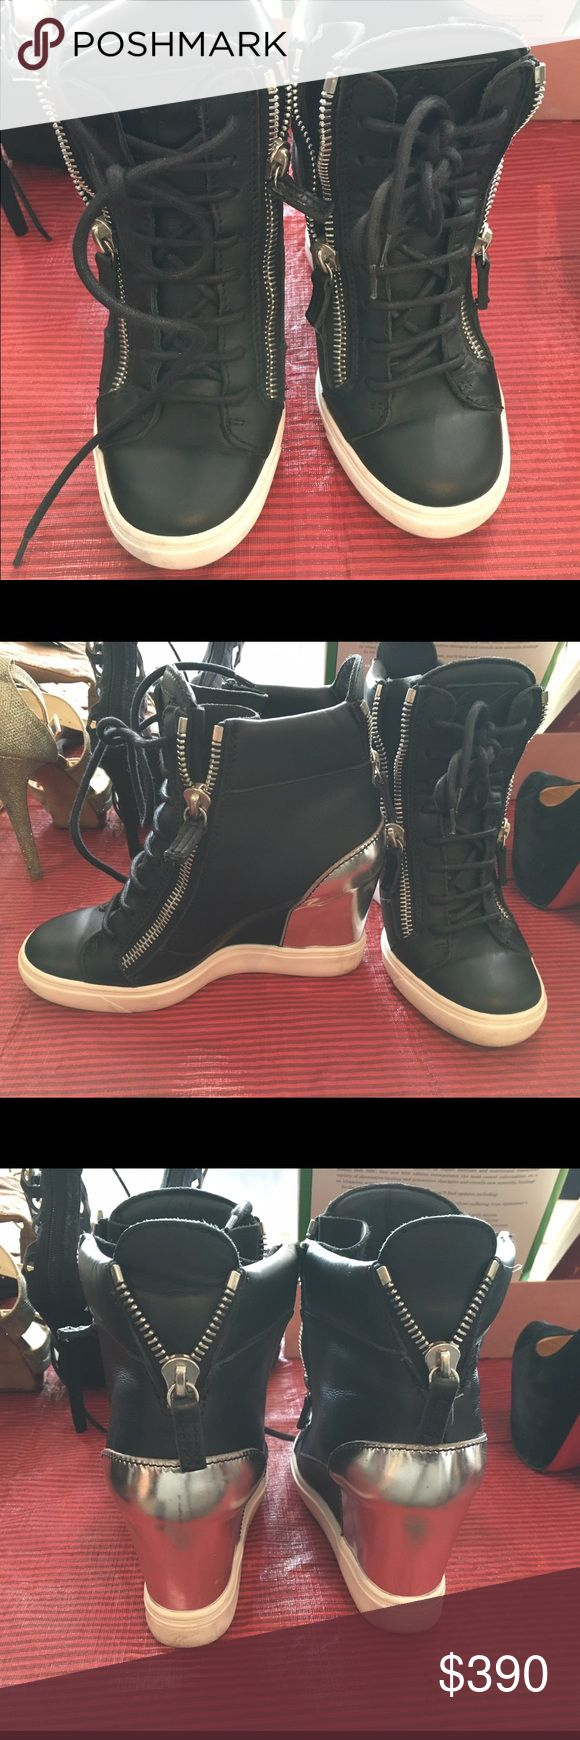 Original Giussepe Zannotti sneakers Original Zannotti wedges sneakers for sale Giuseppe Zanotti Shoes Sneakers